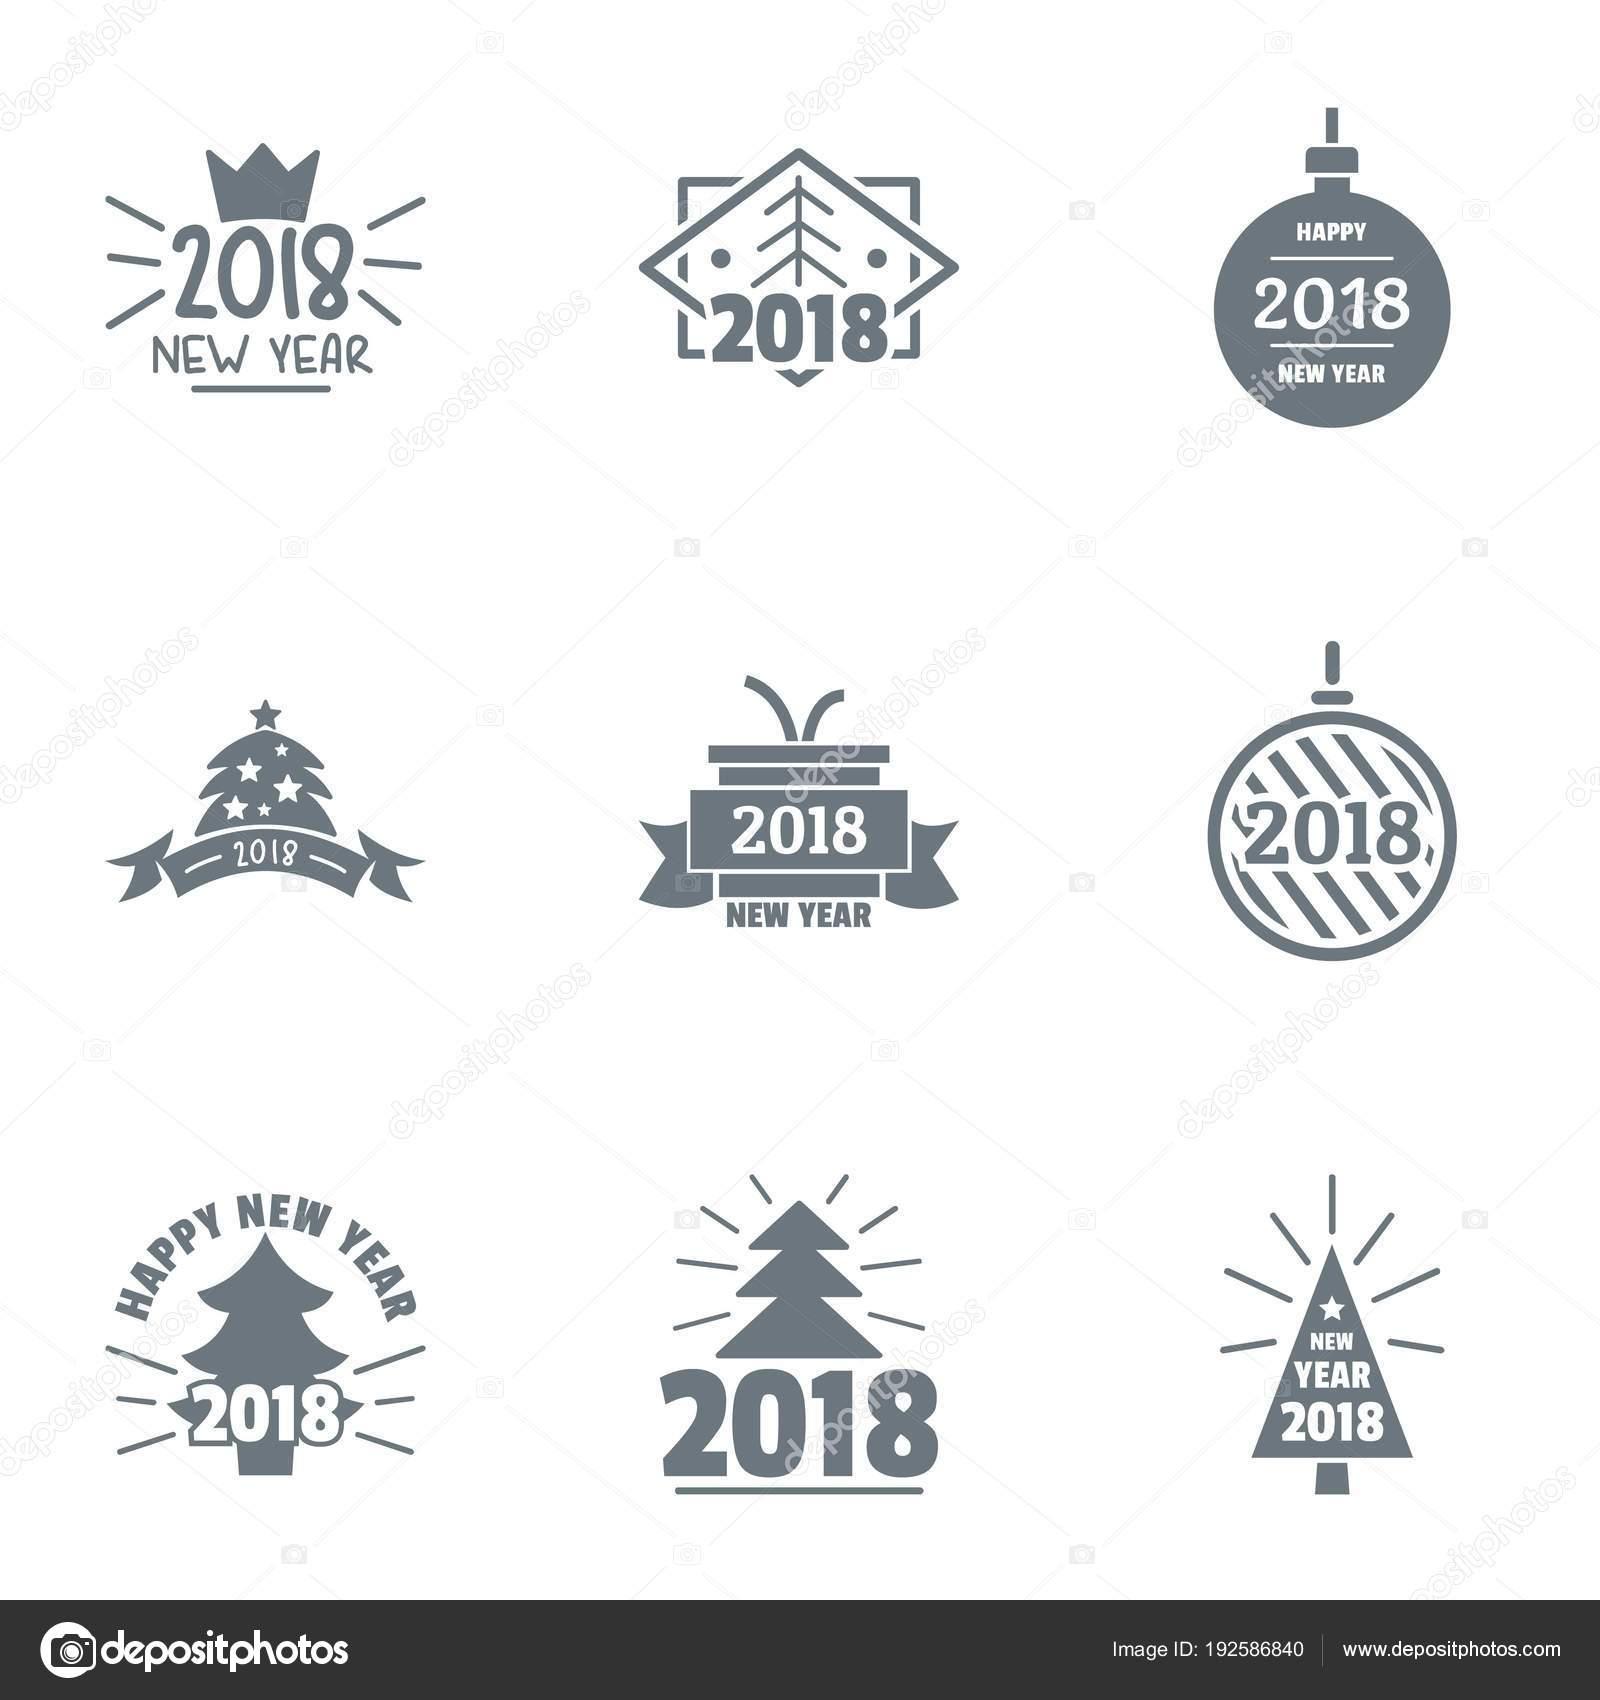 2018 ano novo logotipo definido. Conjunto simples de logotipo de vetor  hipster 9 para web isolado no fundo branco — Vetor de ylivdesign